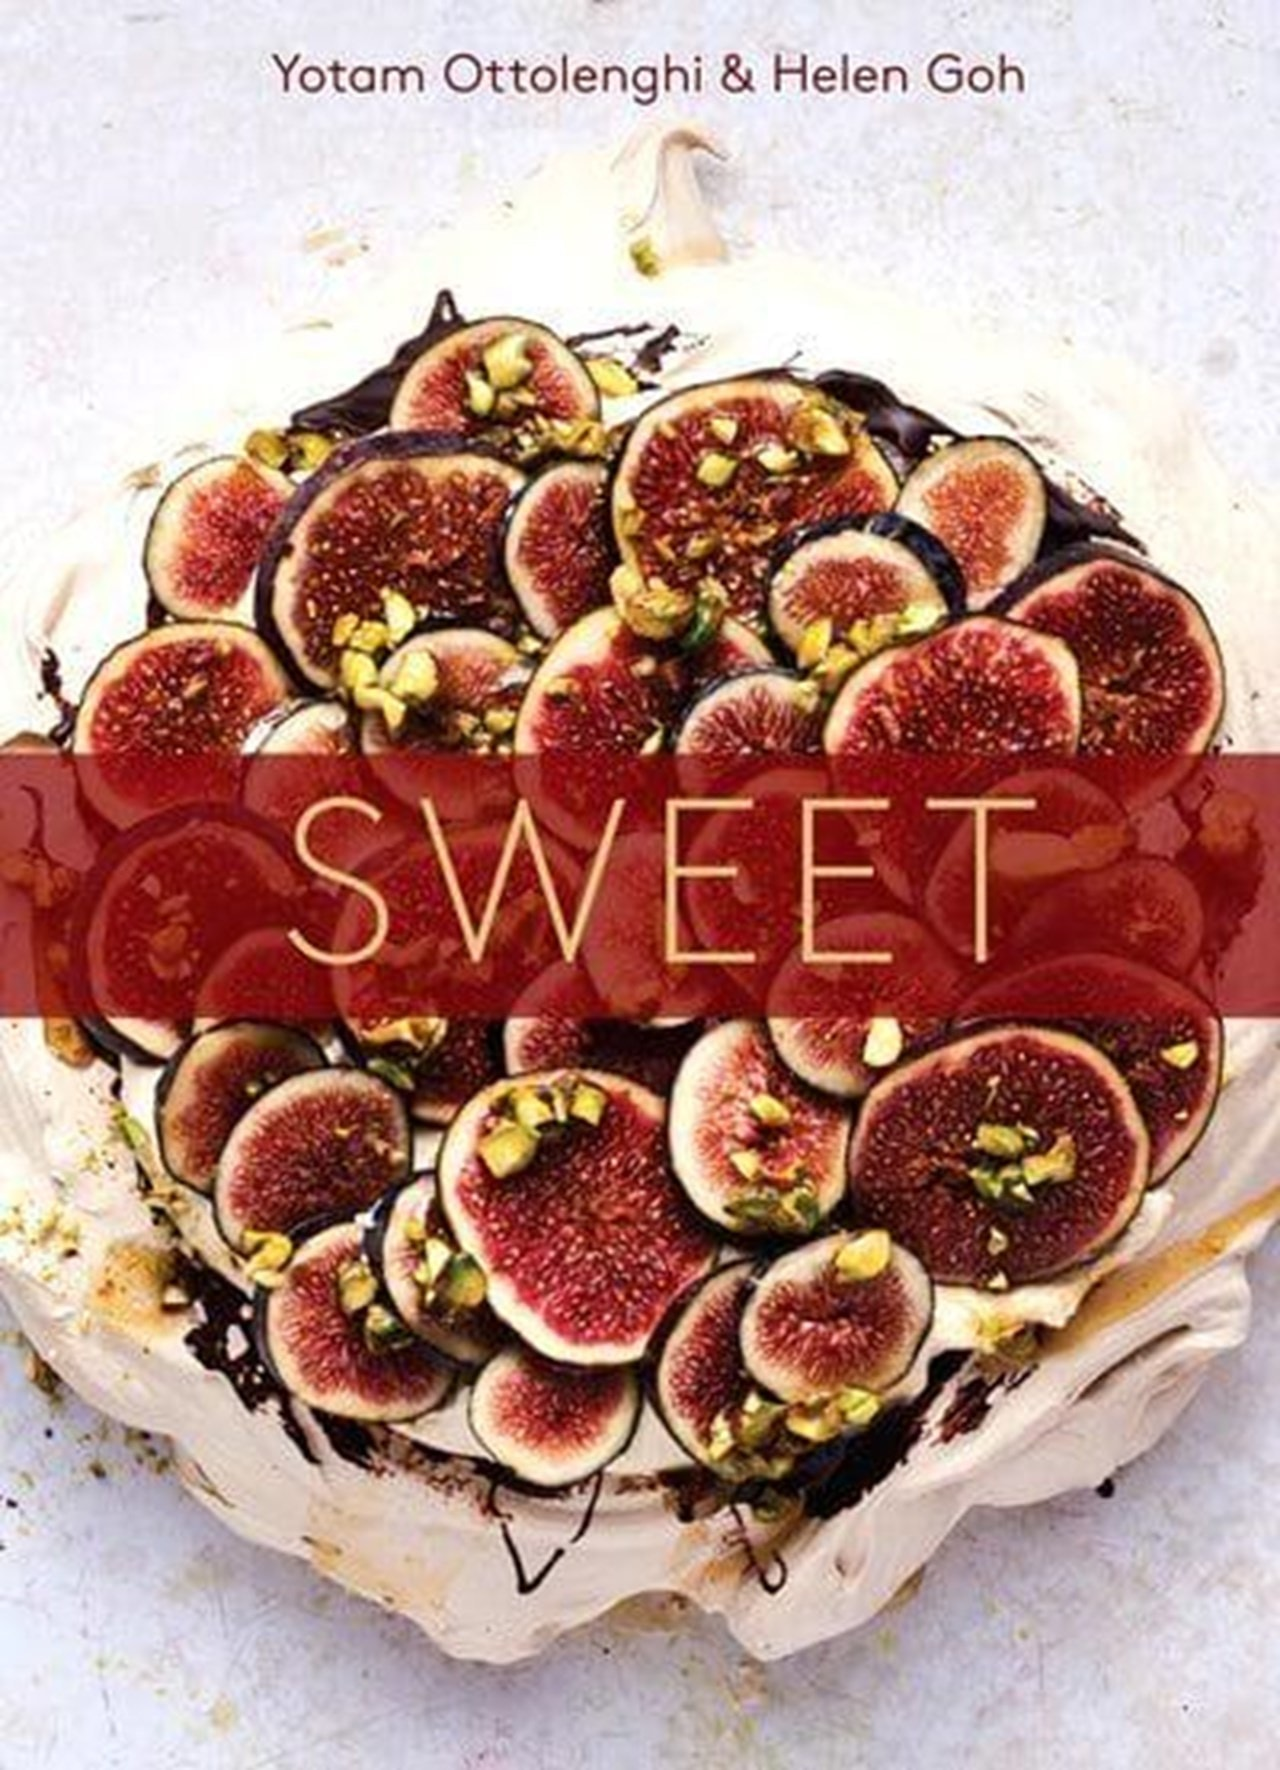 Sweet - 1